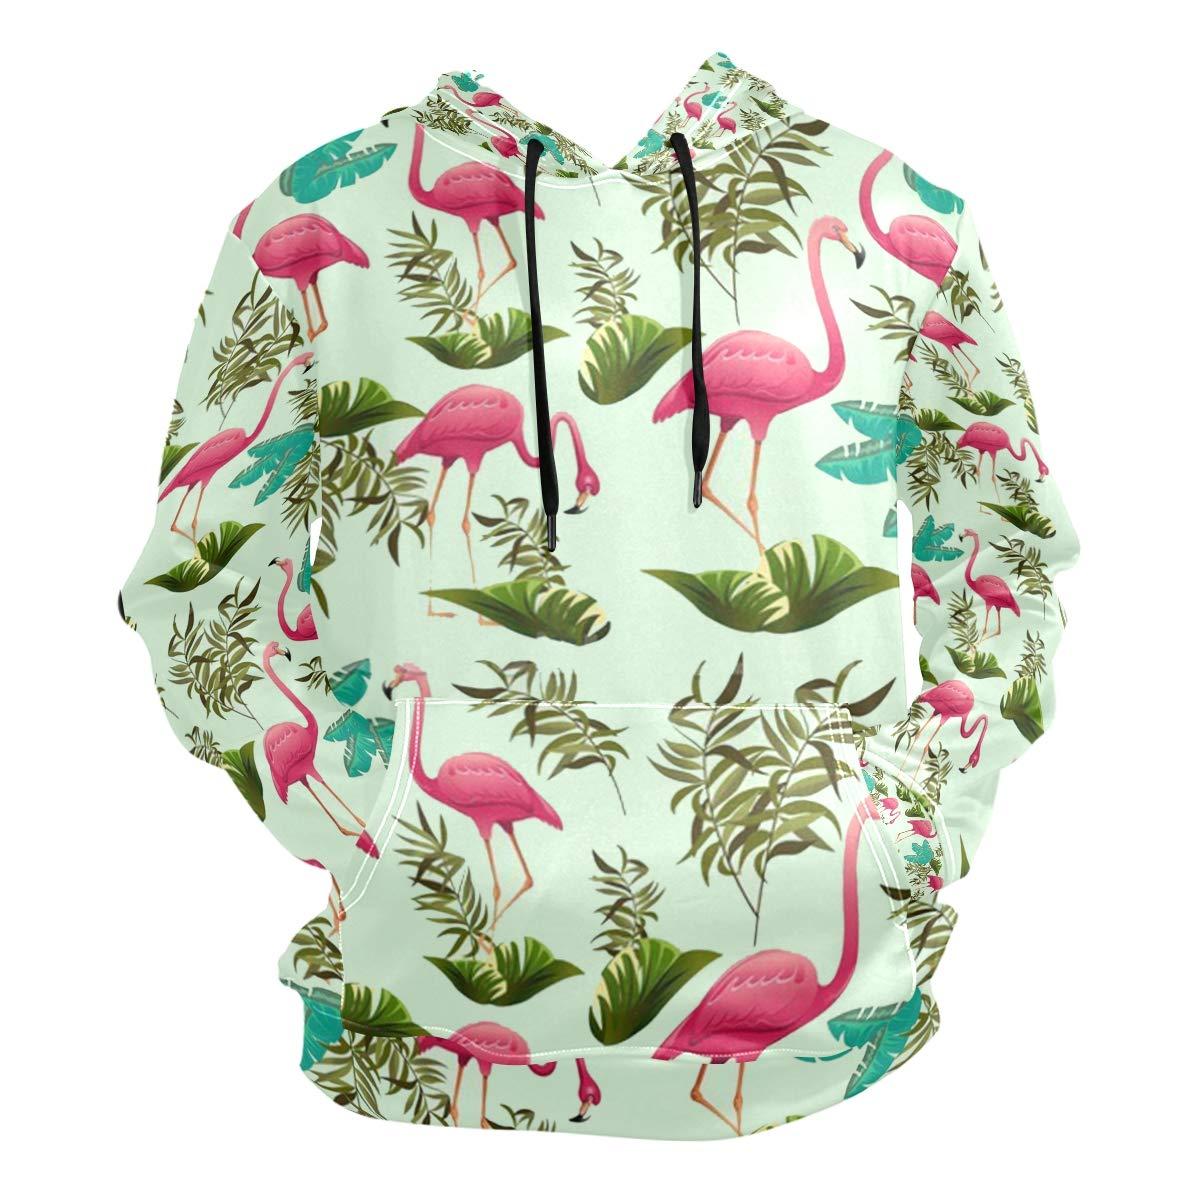 Large Charlley Lee Men's Hooded Sweatshirt Pink Flamingo Pattern Wallpaper Beautiful Fashion Hoodie